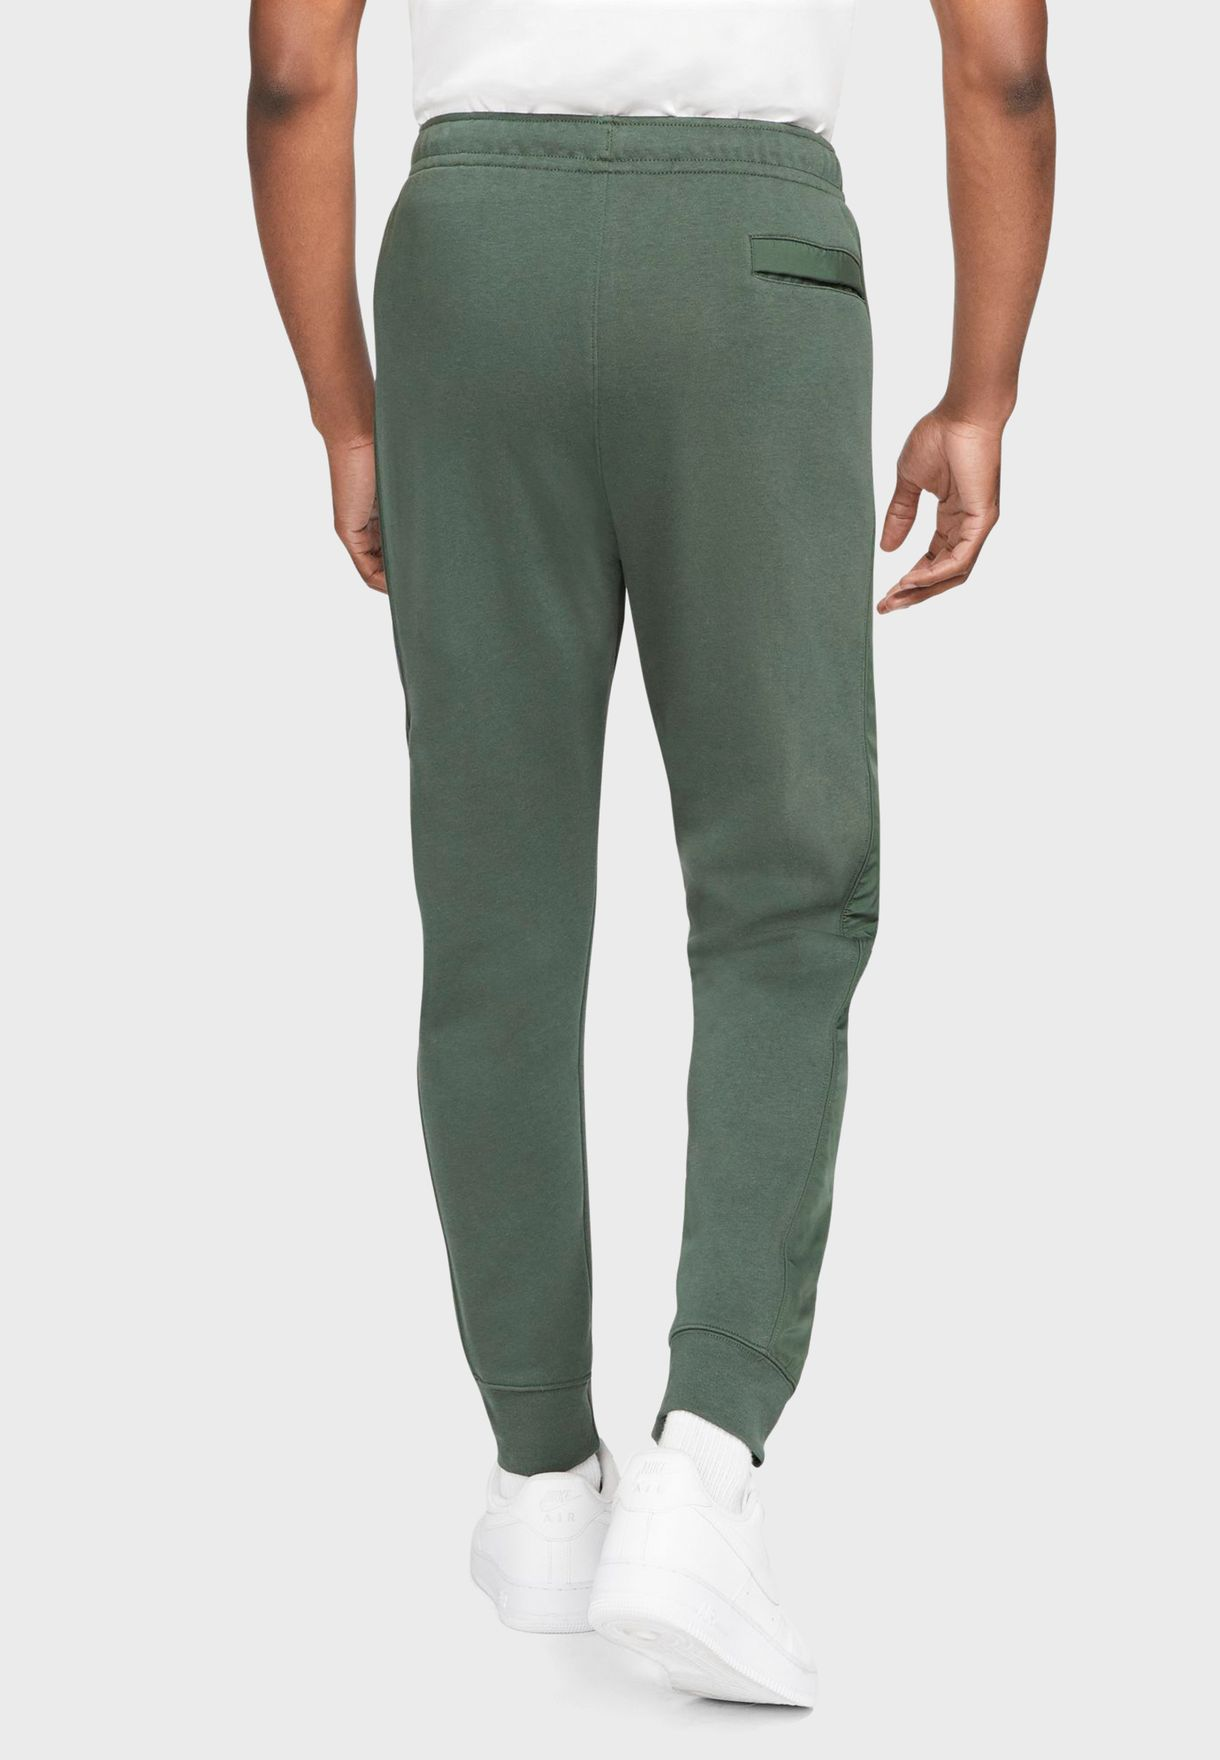 NSW Seasonal Cuffed Sweatpants